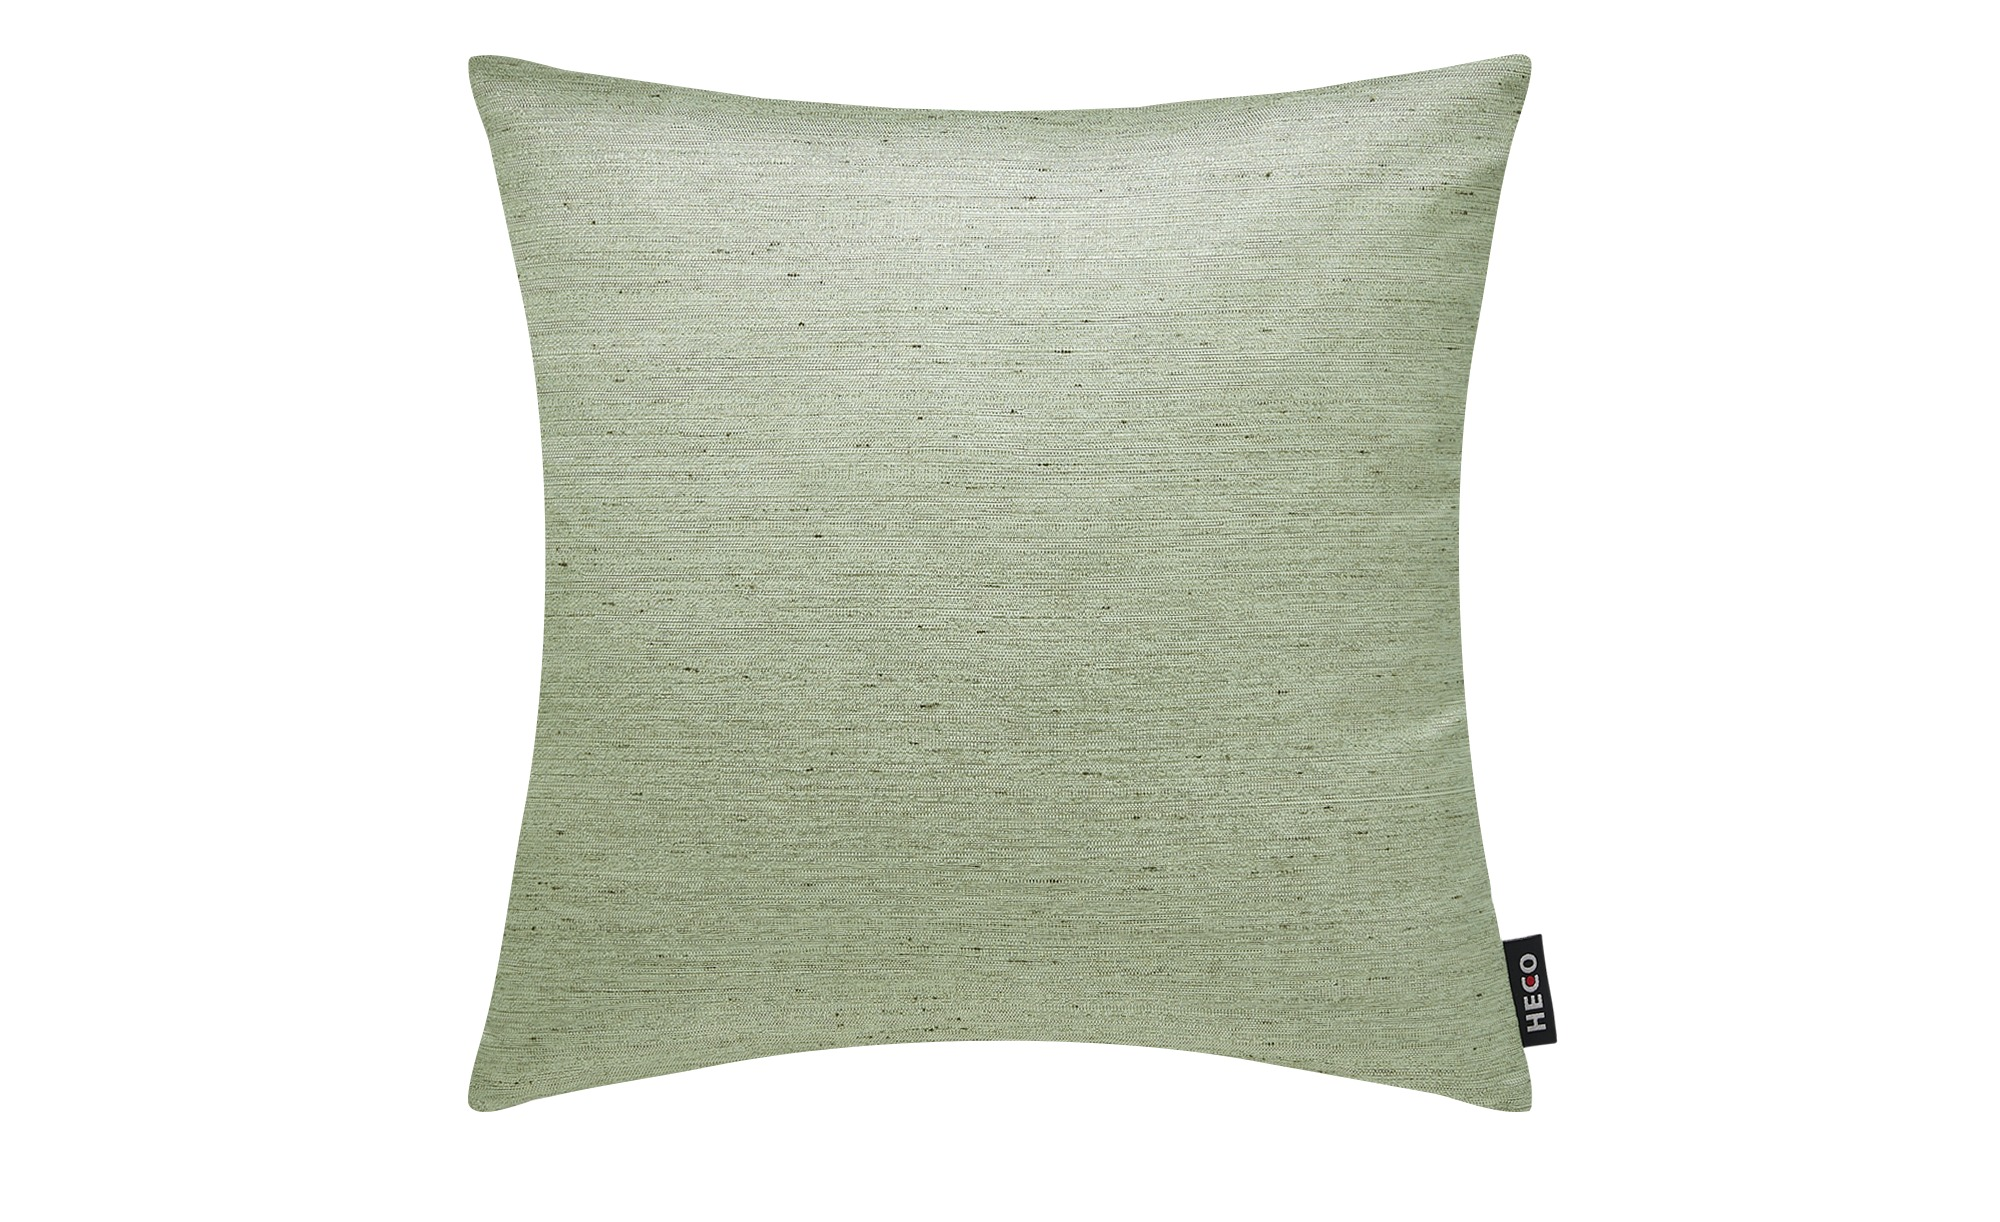 Kissen  Jaipur ¦ grün ¦ 100% Federfüllung ¦ Maße (cm): B: 40 Heimtextilien > Kissen > Dekokissen - Höffner